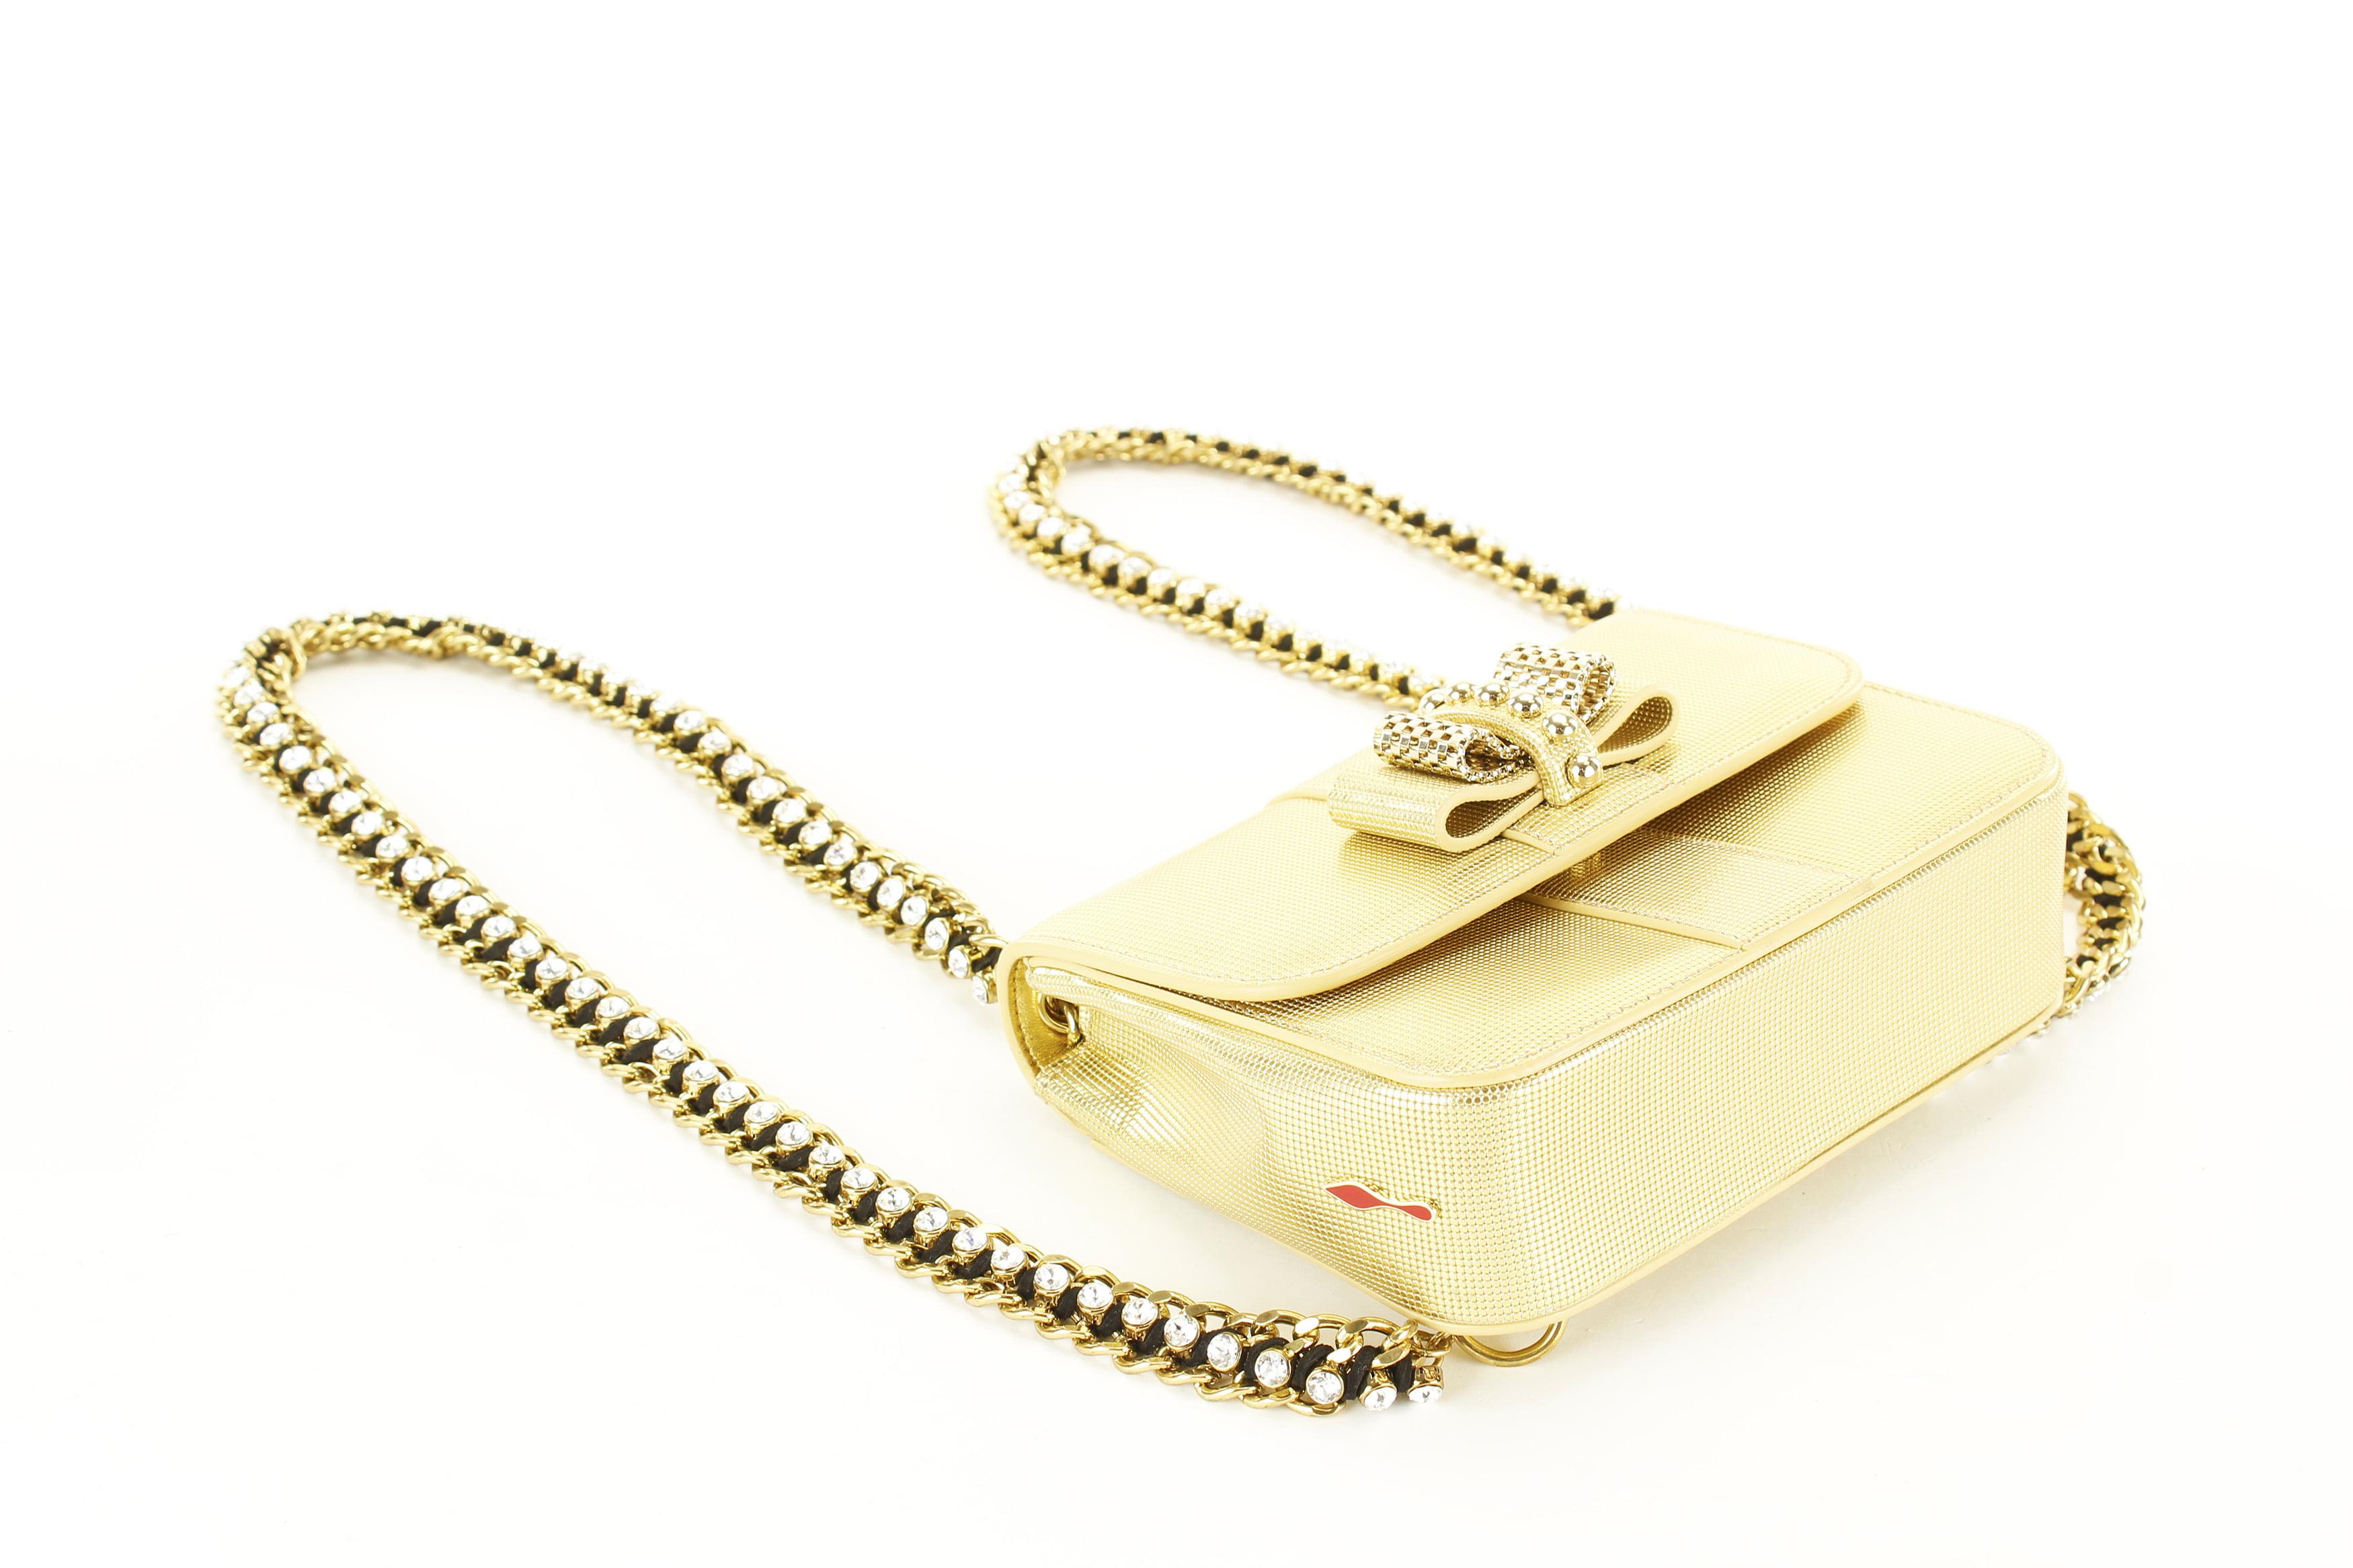 Christian Louboutin - Christian Louboutin Sweet Charity Mini Gold Leather  Womens Backpack - Walmart.com 103d4a4757dab